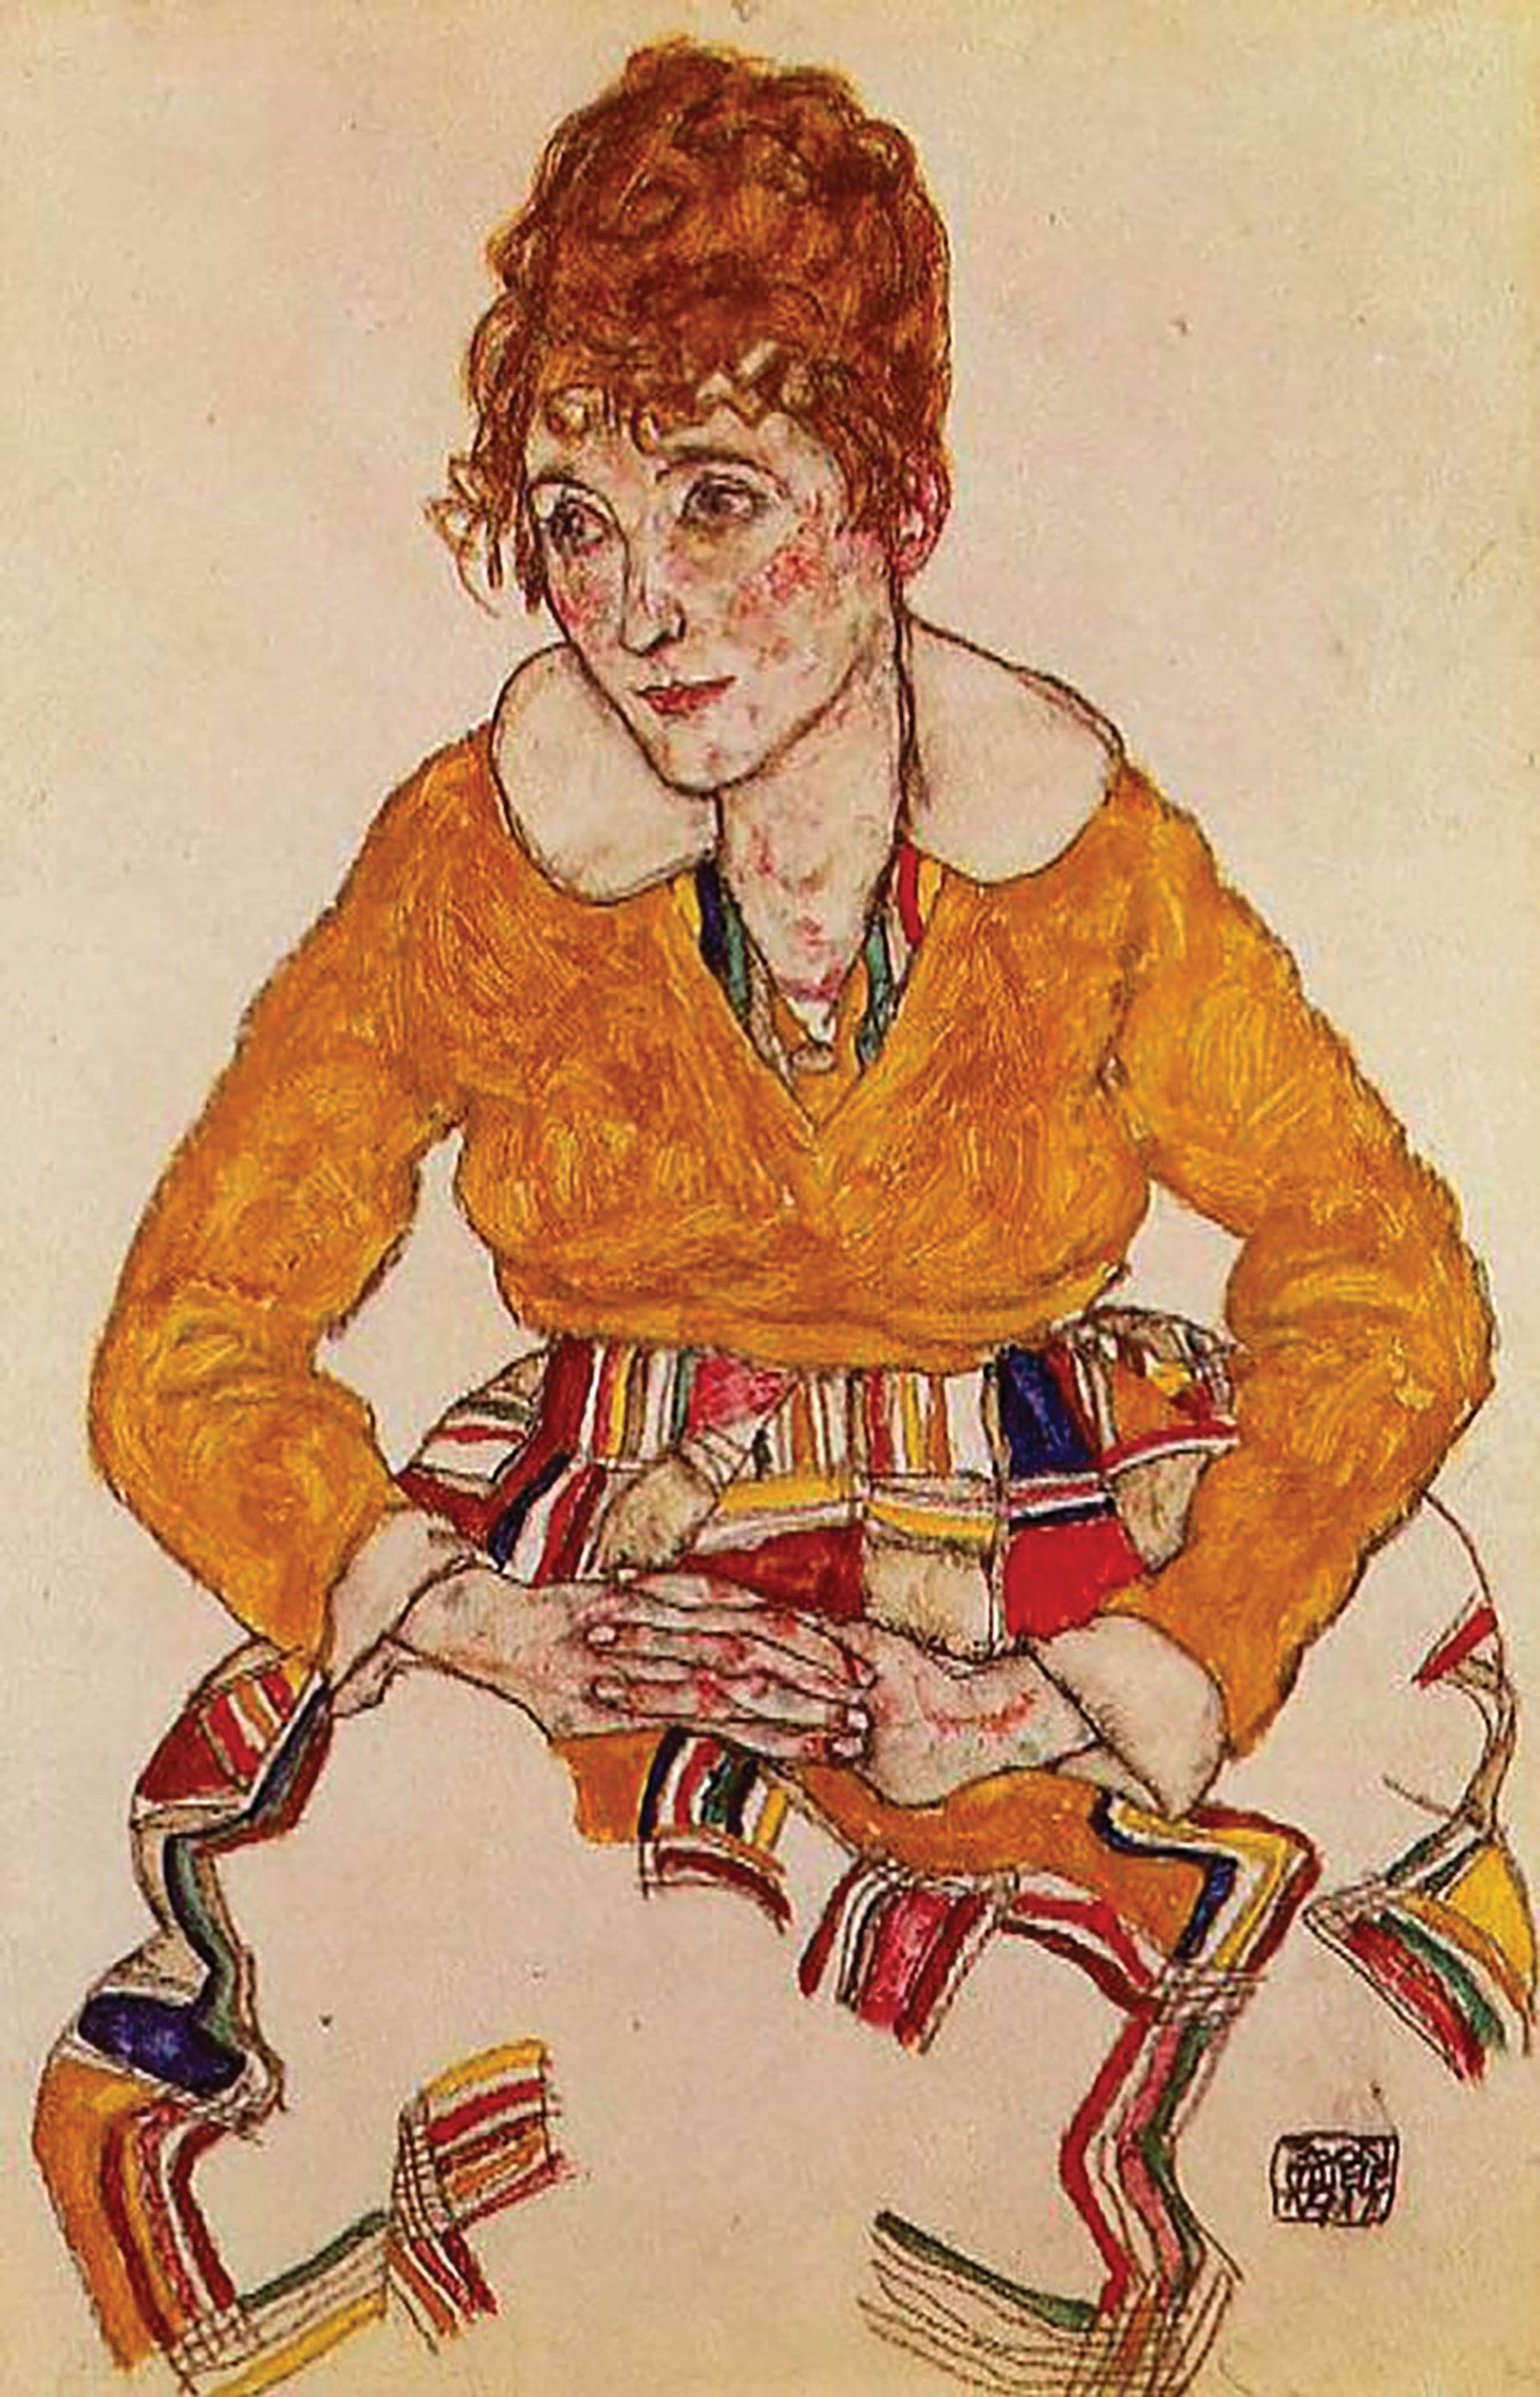 Exhibit A: Egon Schiele, Portrait of the Artist's Wife (1917)